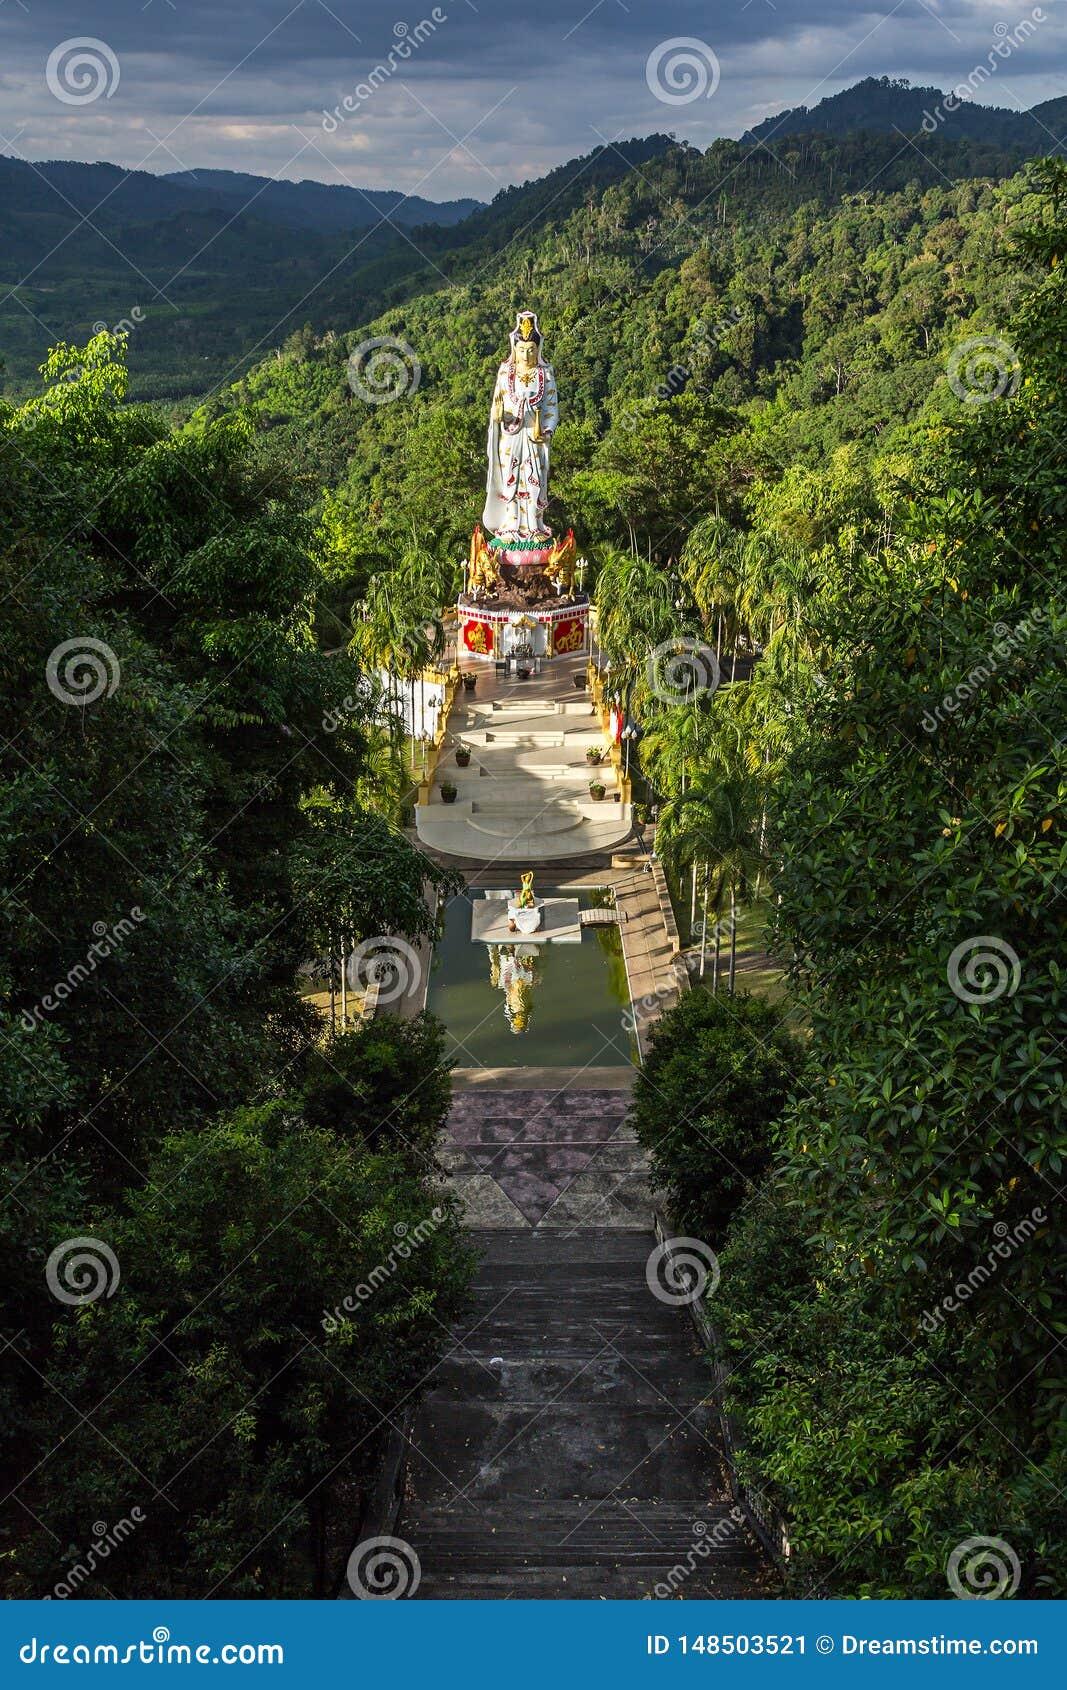 The statue of goddess Guan Yin in Wat Bang Riang in Thailand